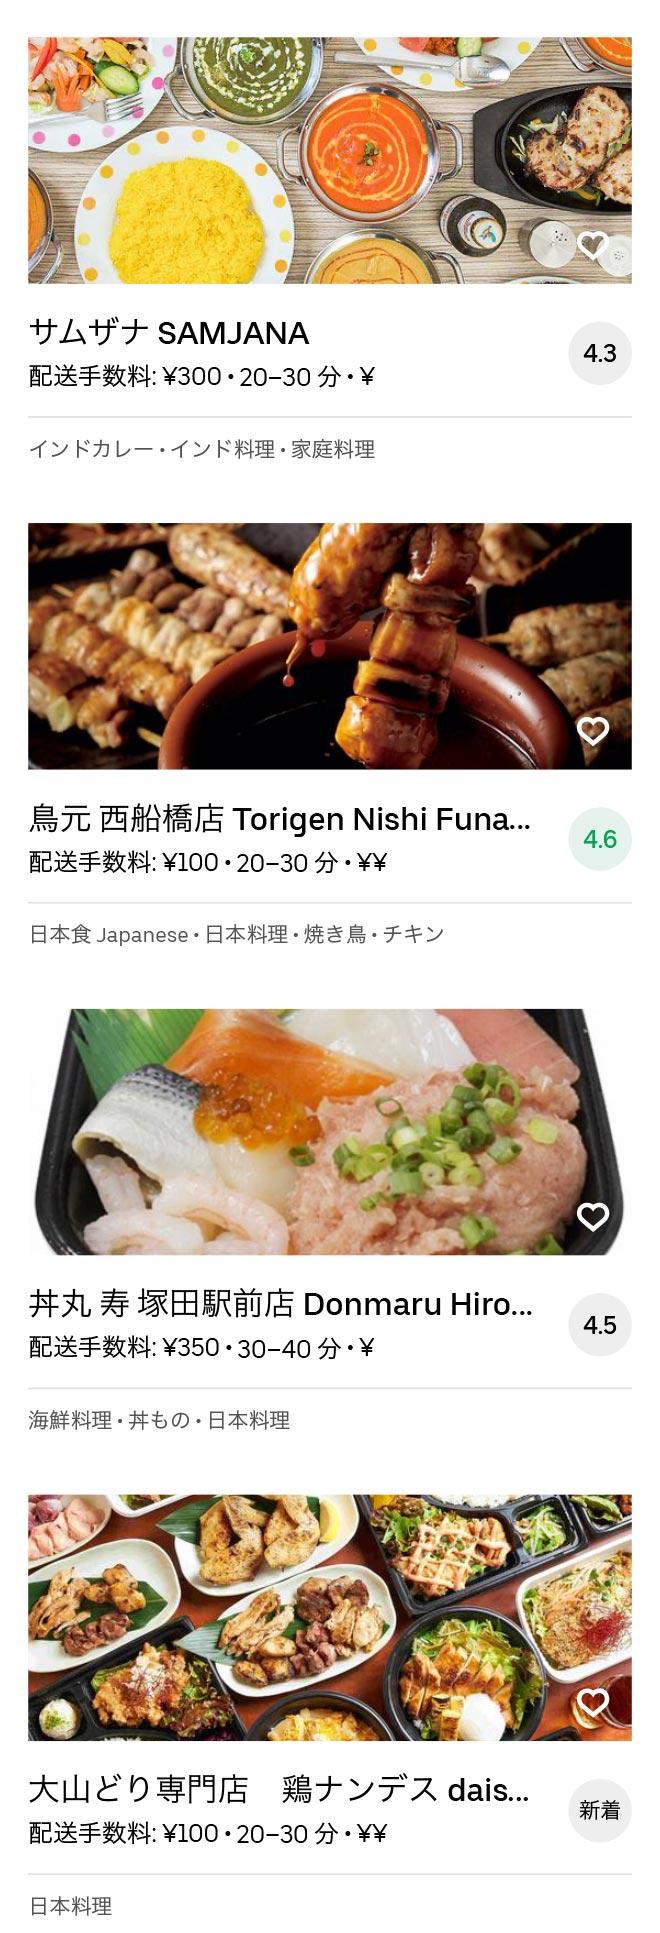 Nishi funabashi menu 2008 08